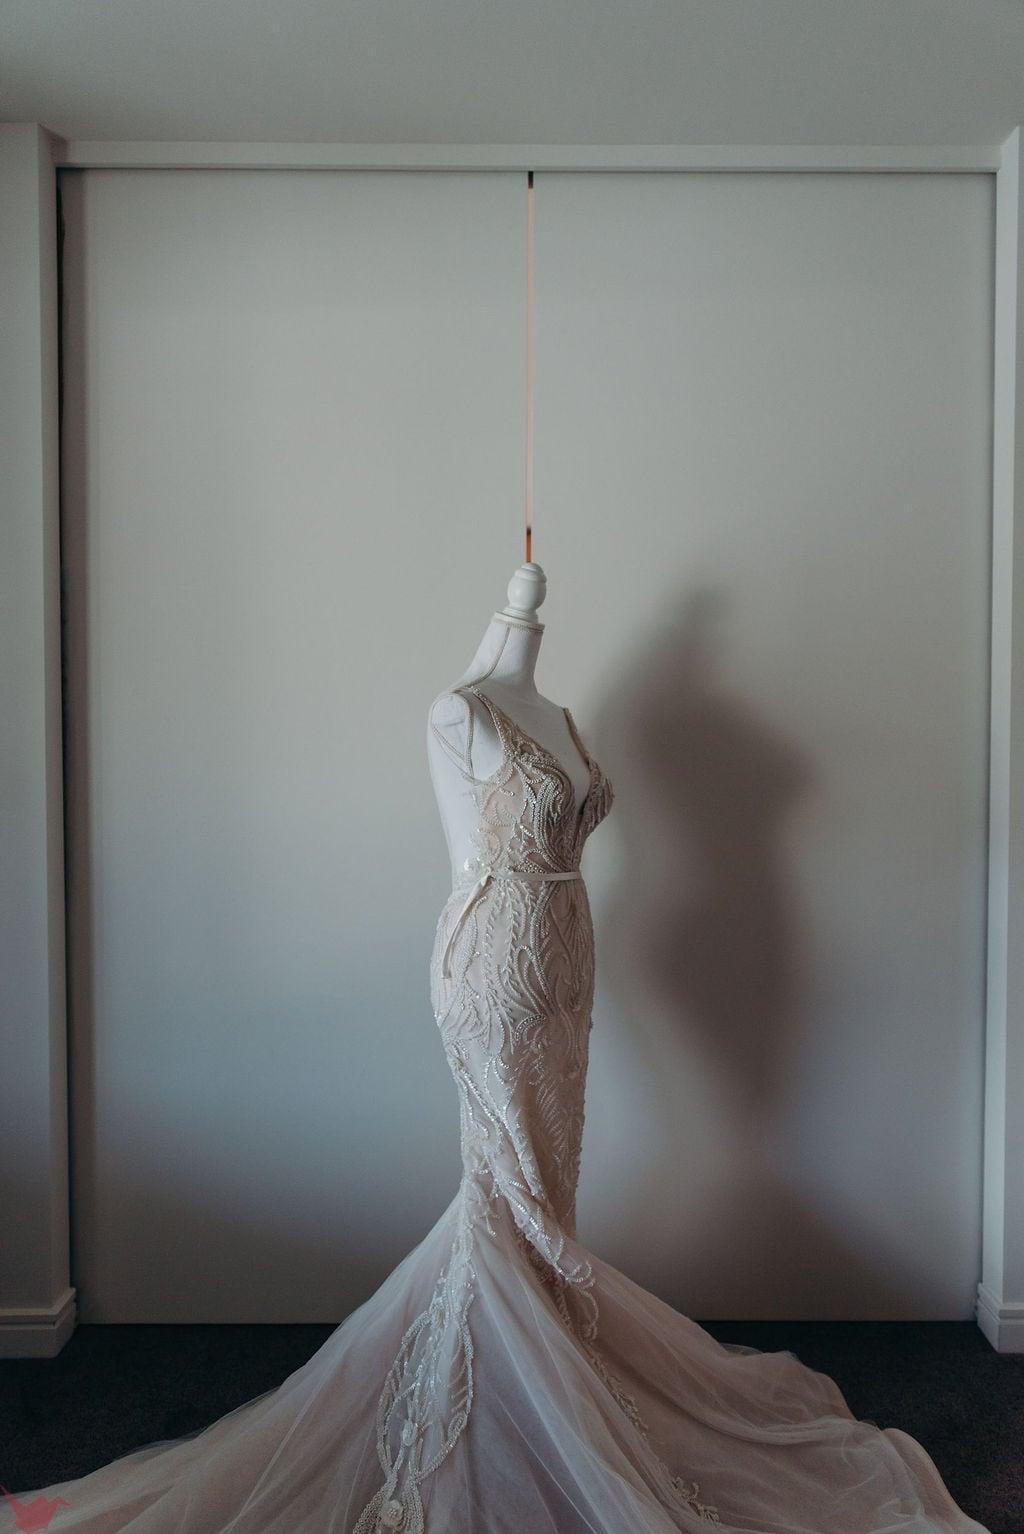 james-felicia-papercrane-wedding-photography-7.jpg